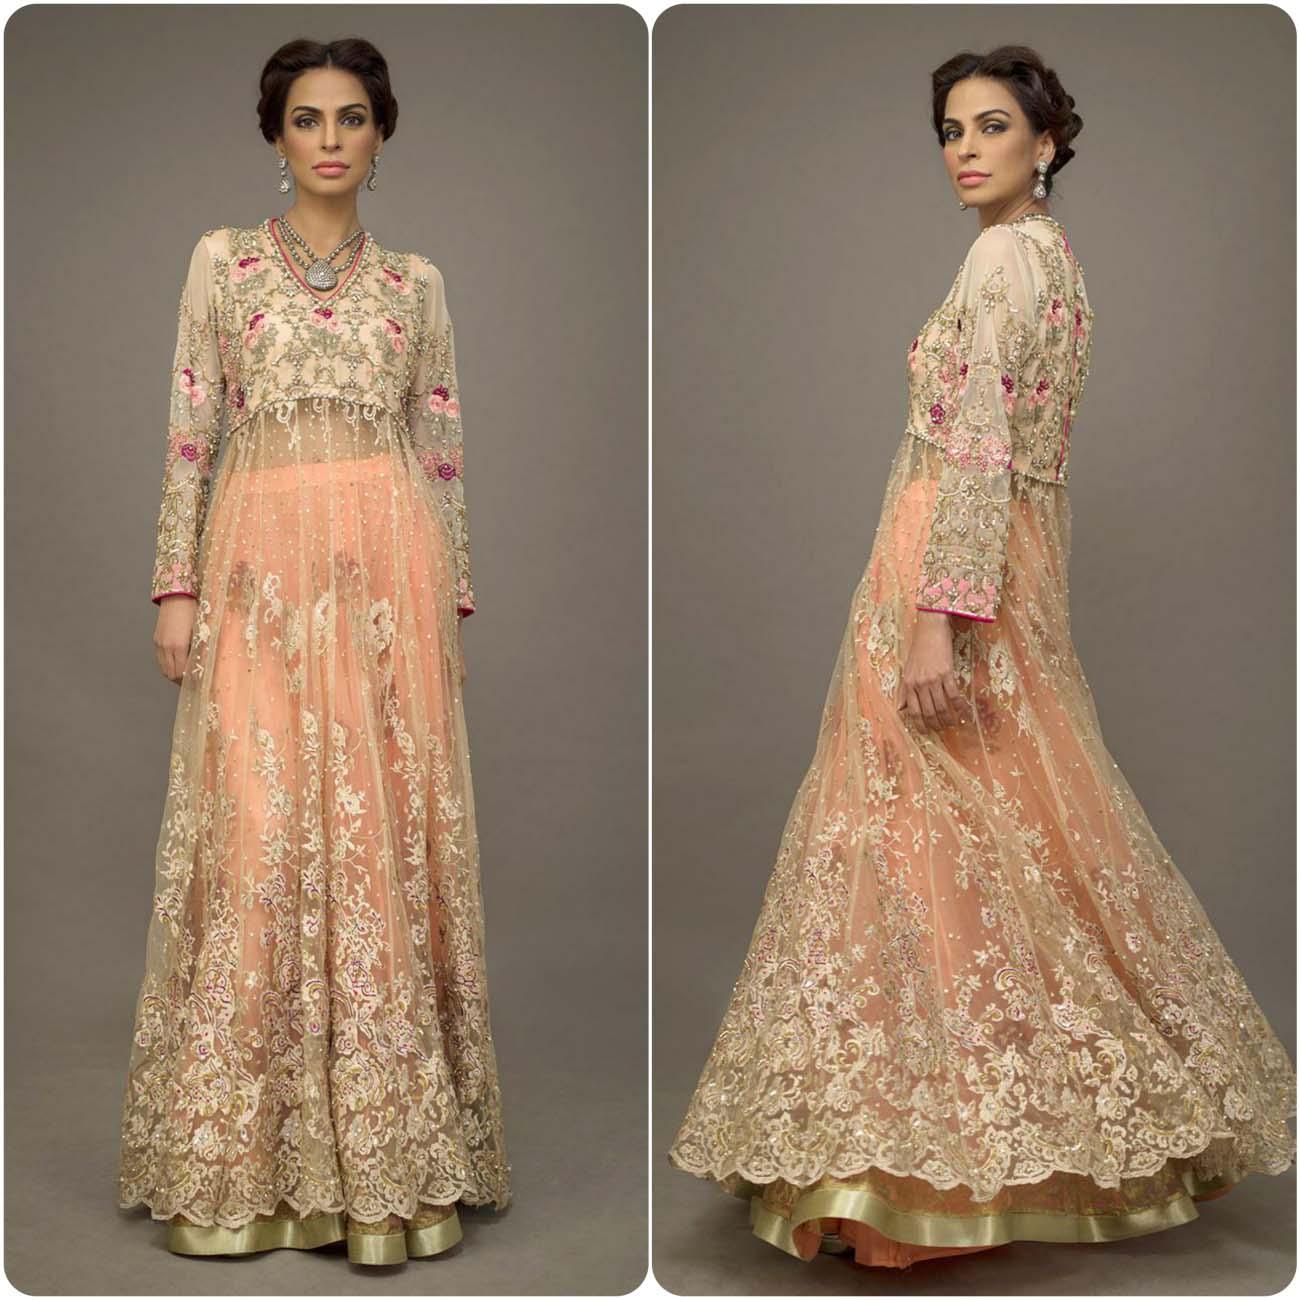 Deepak perwani Wedding Dresses Collection Fo Women 2016-2017...styloplanet (15)